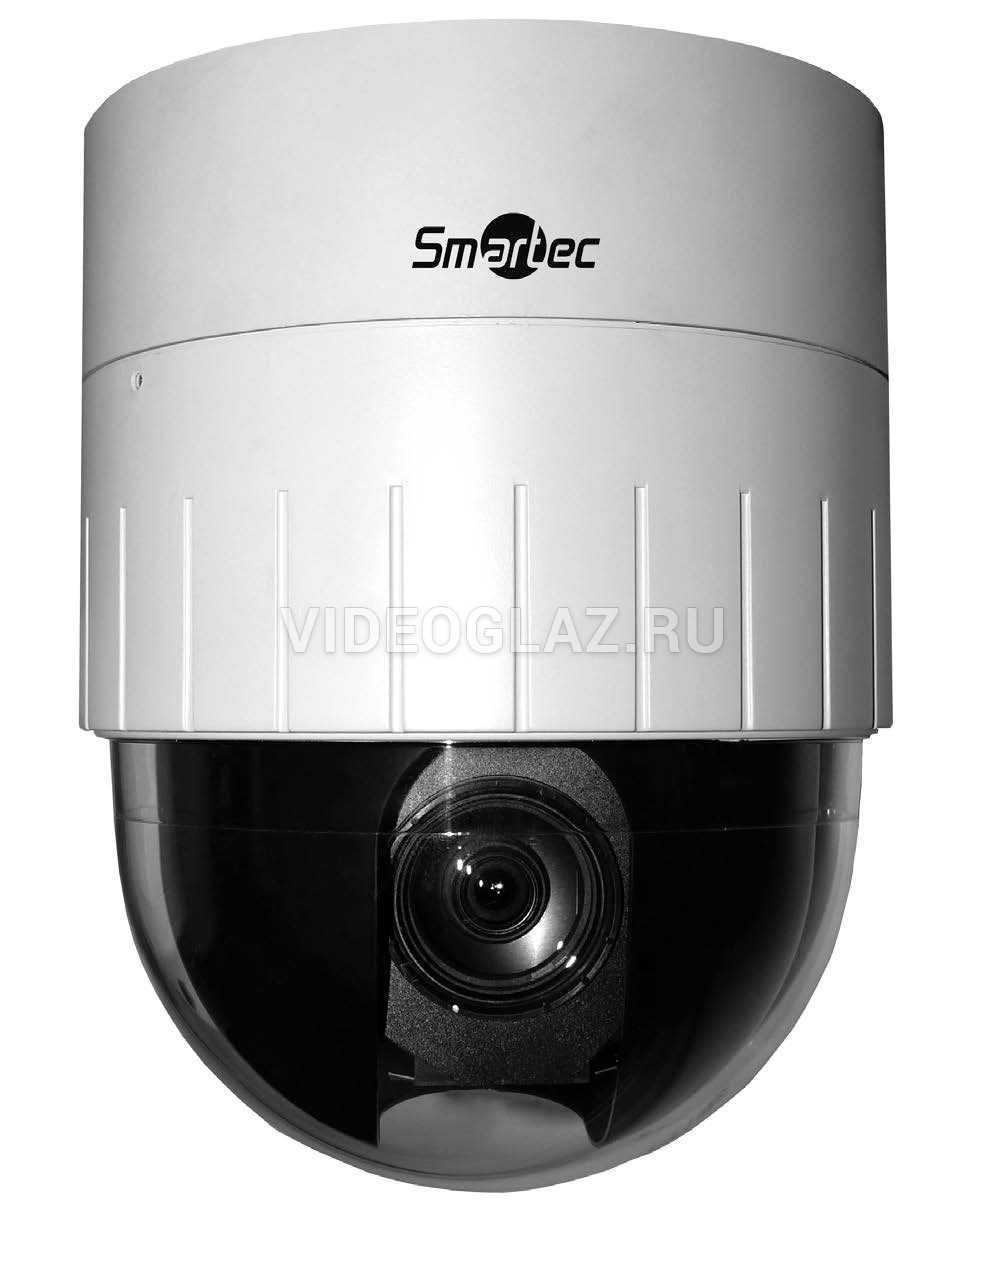 Видеокамера Smartec STC-HD3925/2